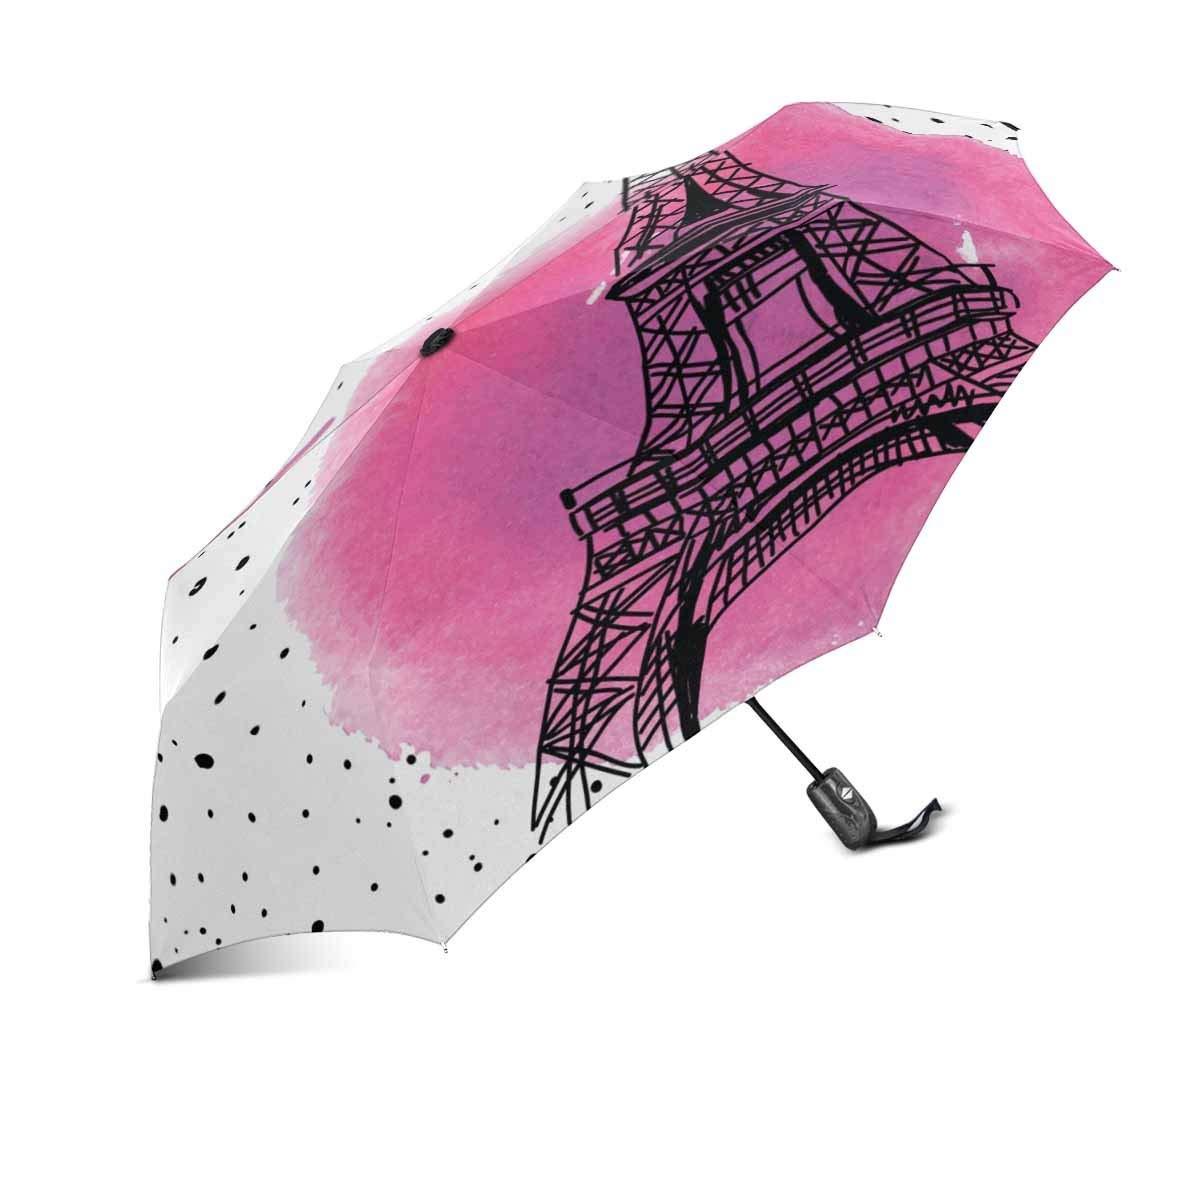 InterestPrint I Love Paris Eiffel Tower France 100% Polyester Pongee Windproof Fabric Travel Umbrella, Compact Automatic Open and Close Folding UV and Rain Umbrella